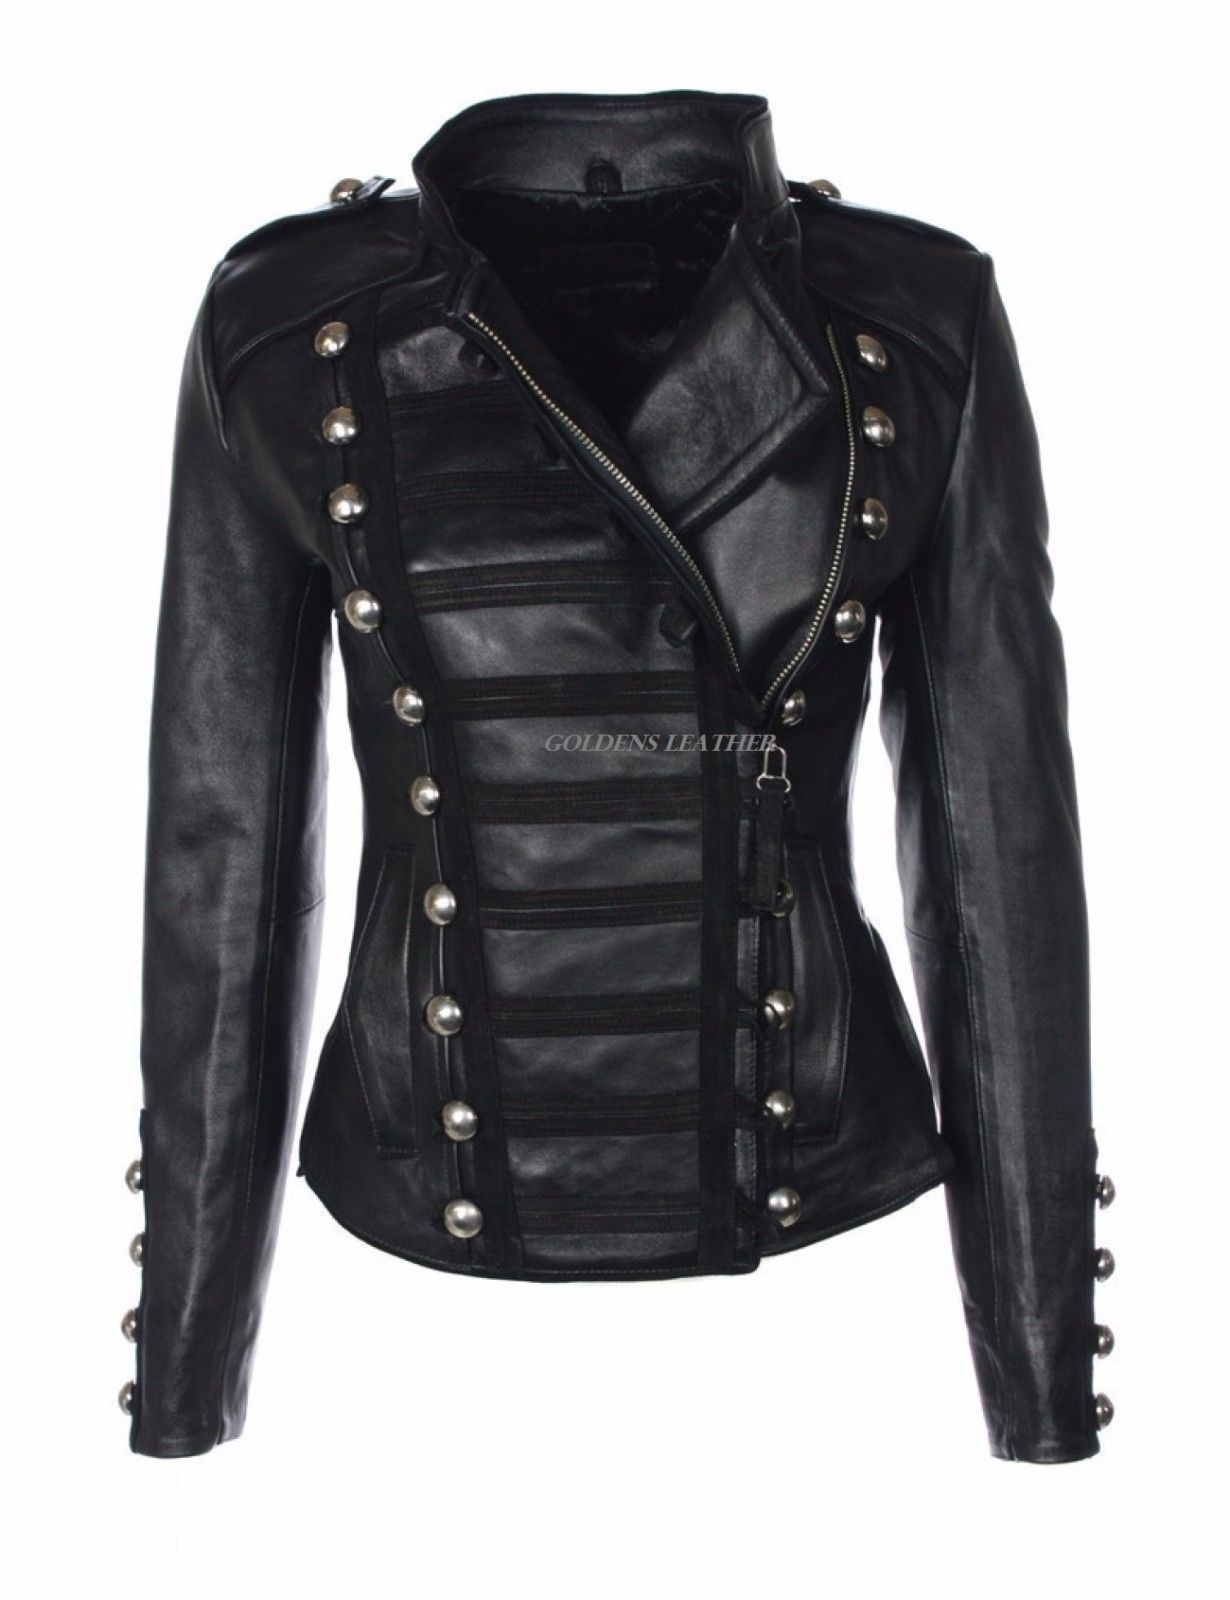 Designer Style Women Lambskin Leather Military Style Soft